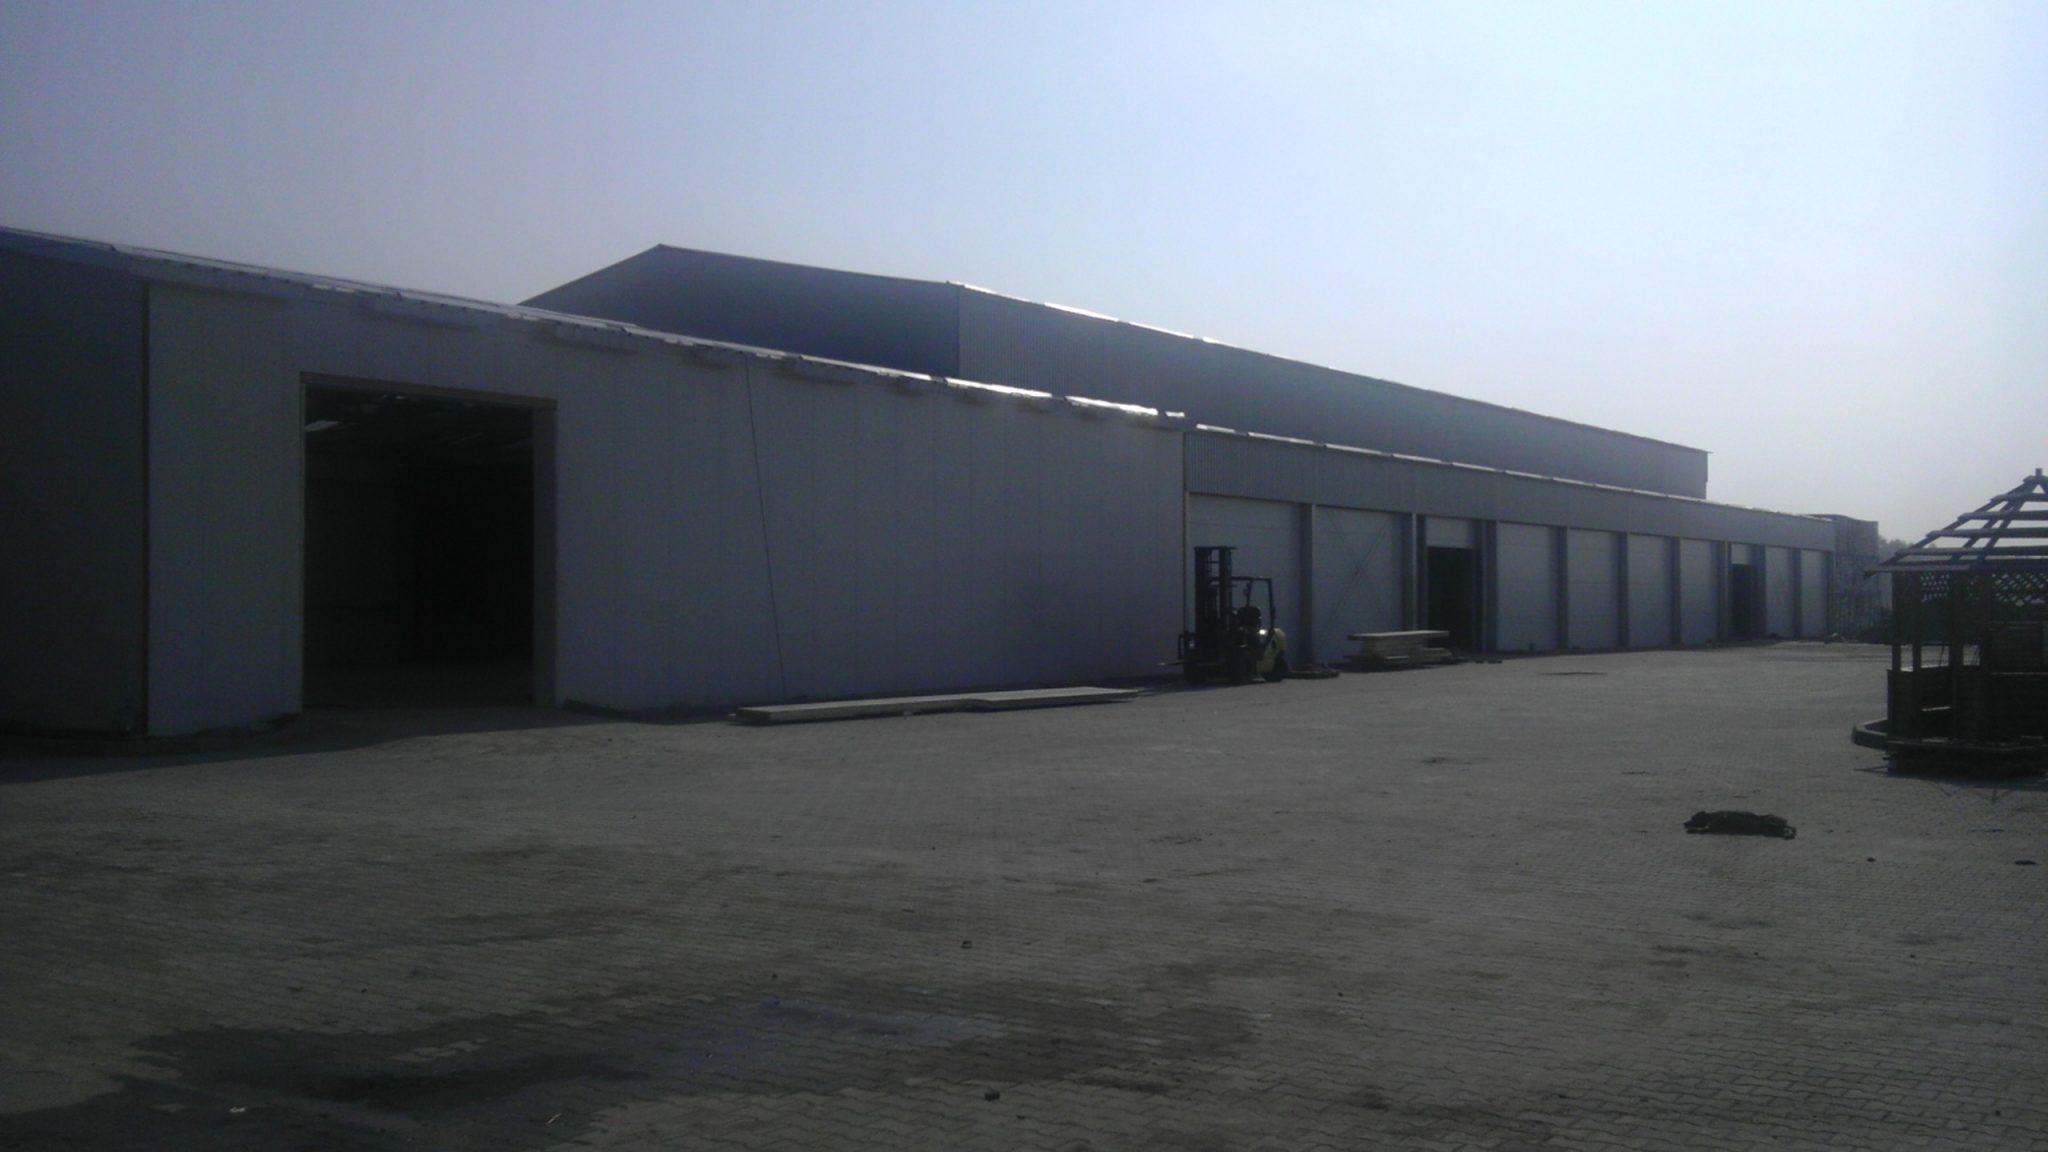 Овощехранилище (комплекс): хранилище - 18х60х8 м, сортировка 18х18х4,5 м, коридор 6х66х4,5 м